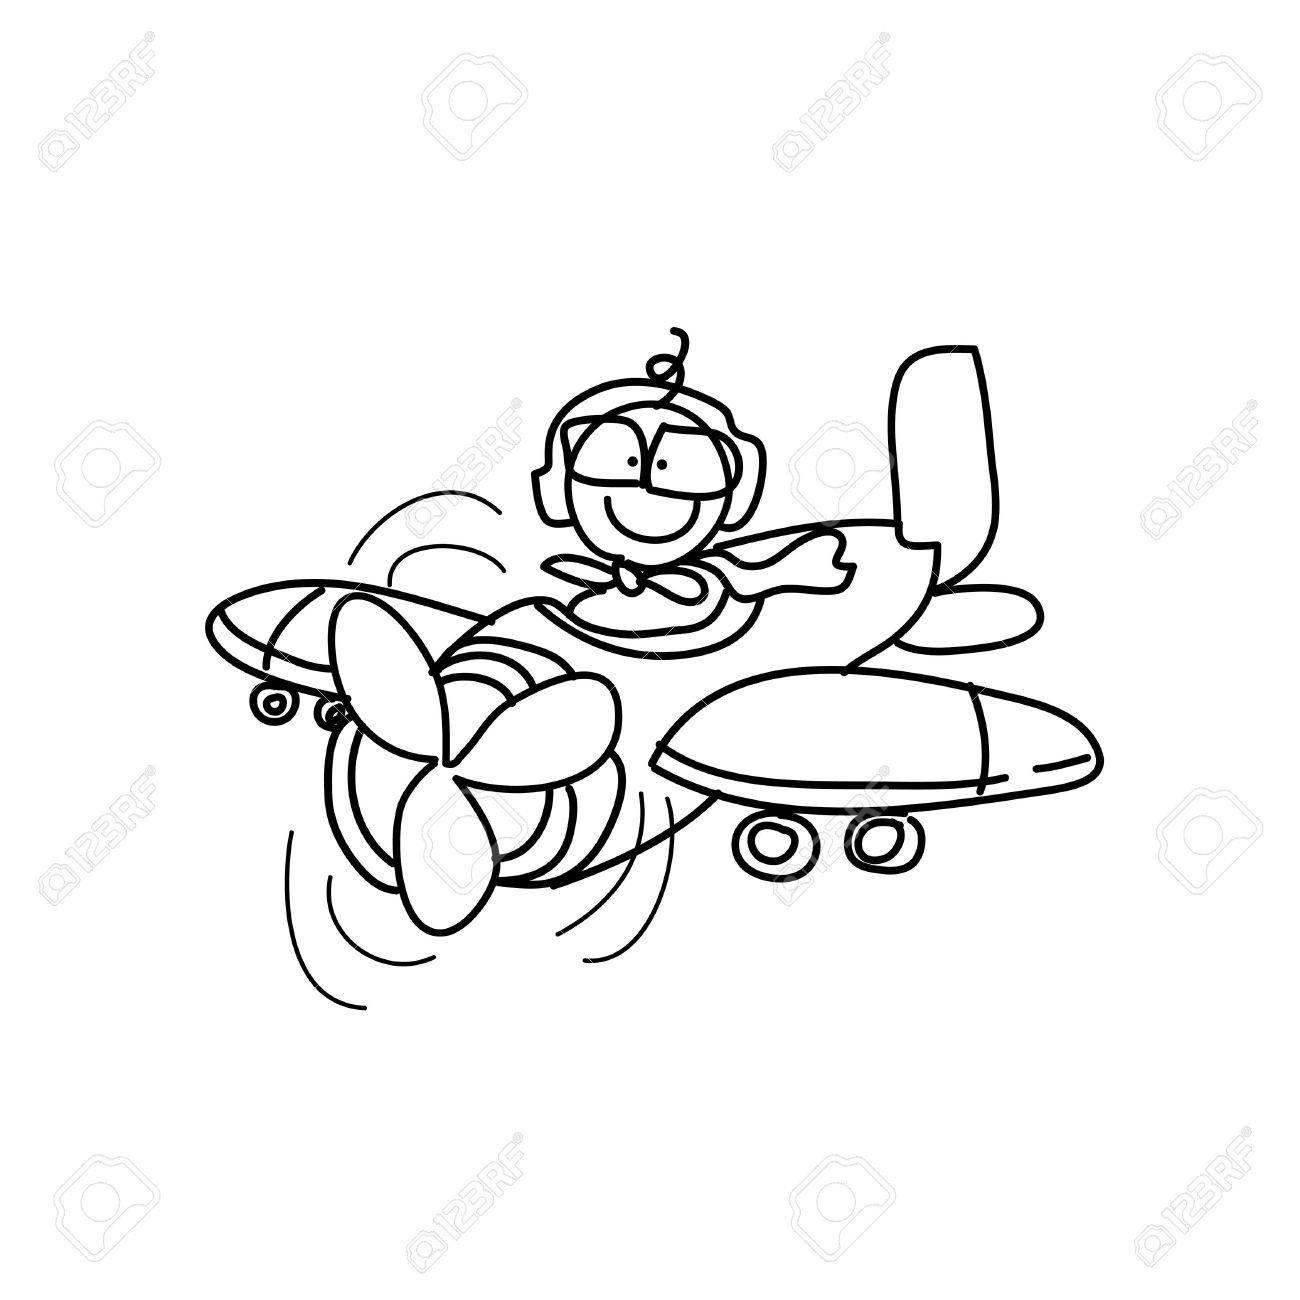 1300x1300 Airplane Cartoon Drawing Cartoon Hand Drawing Imagination